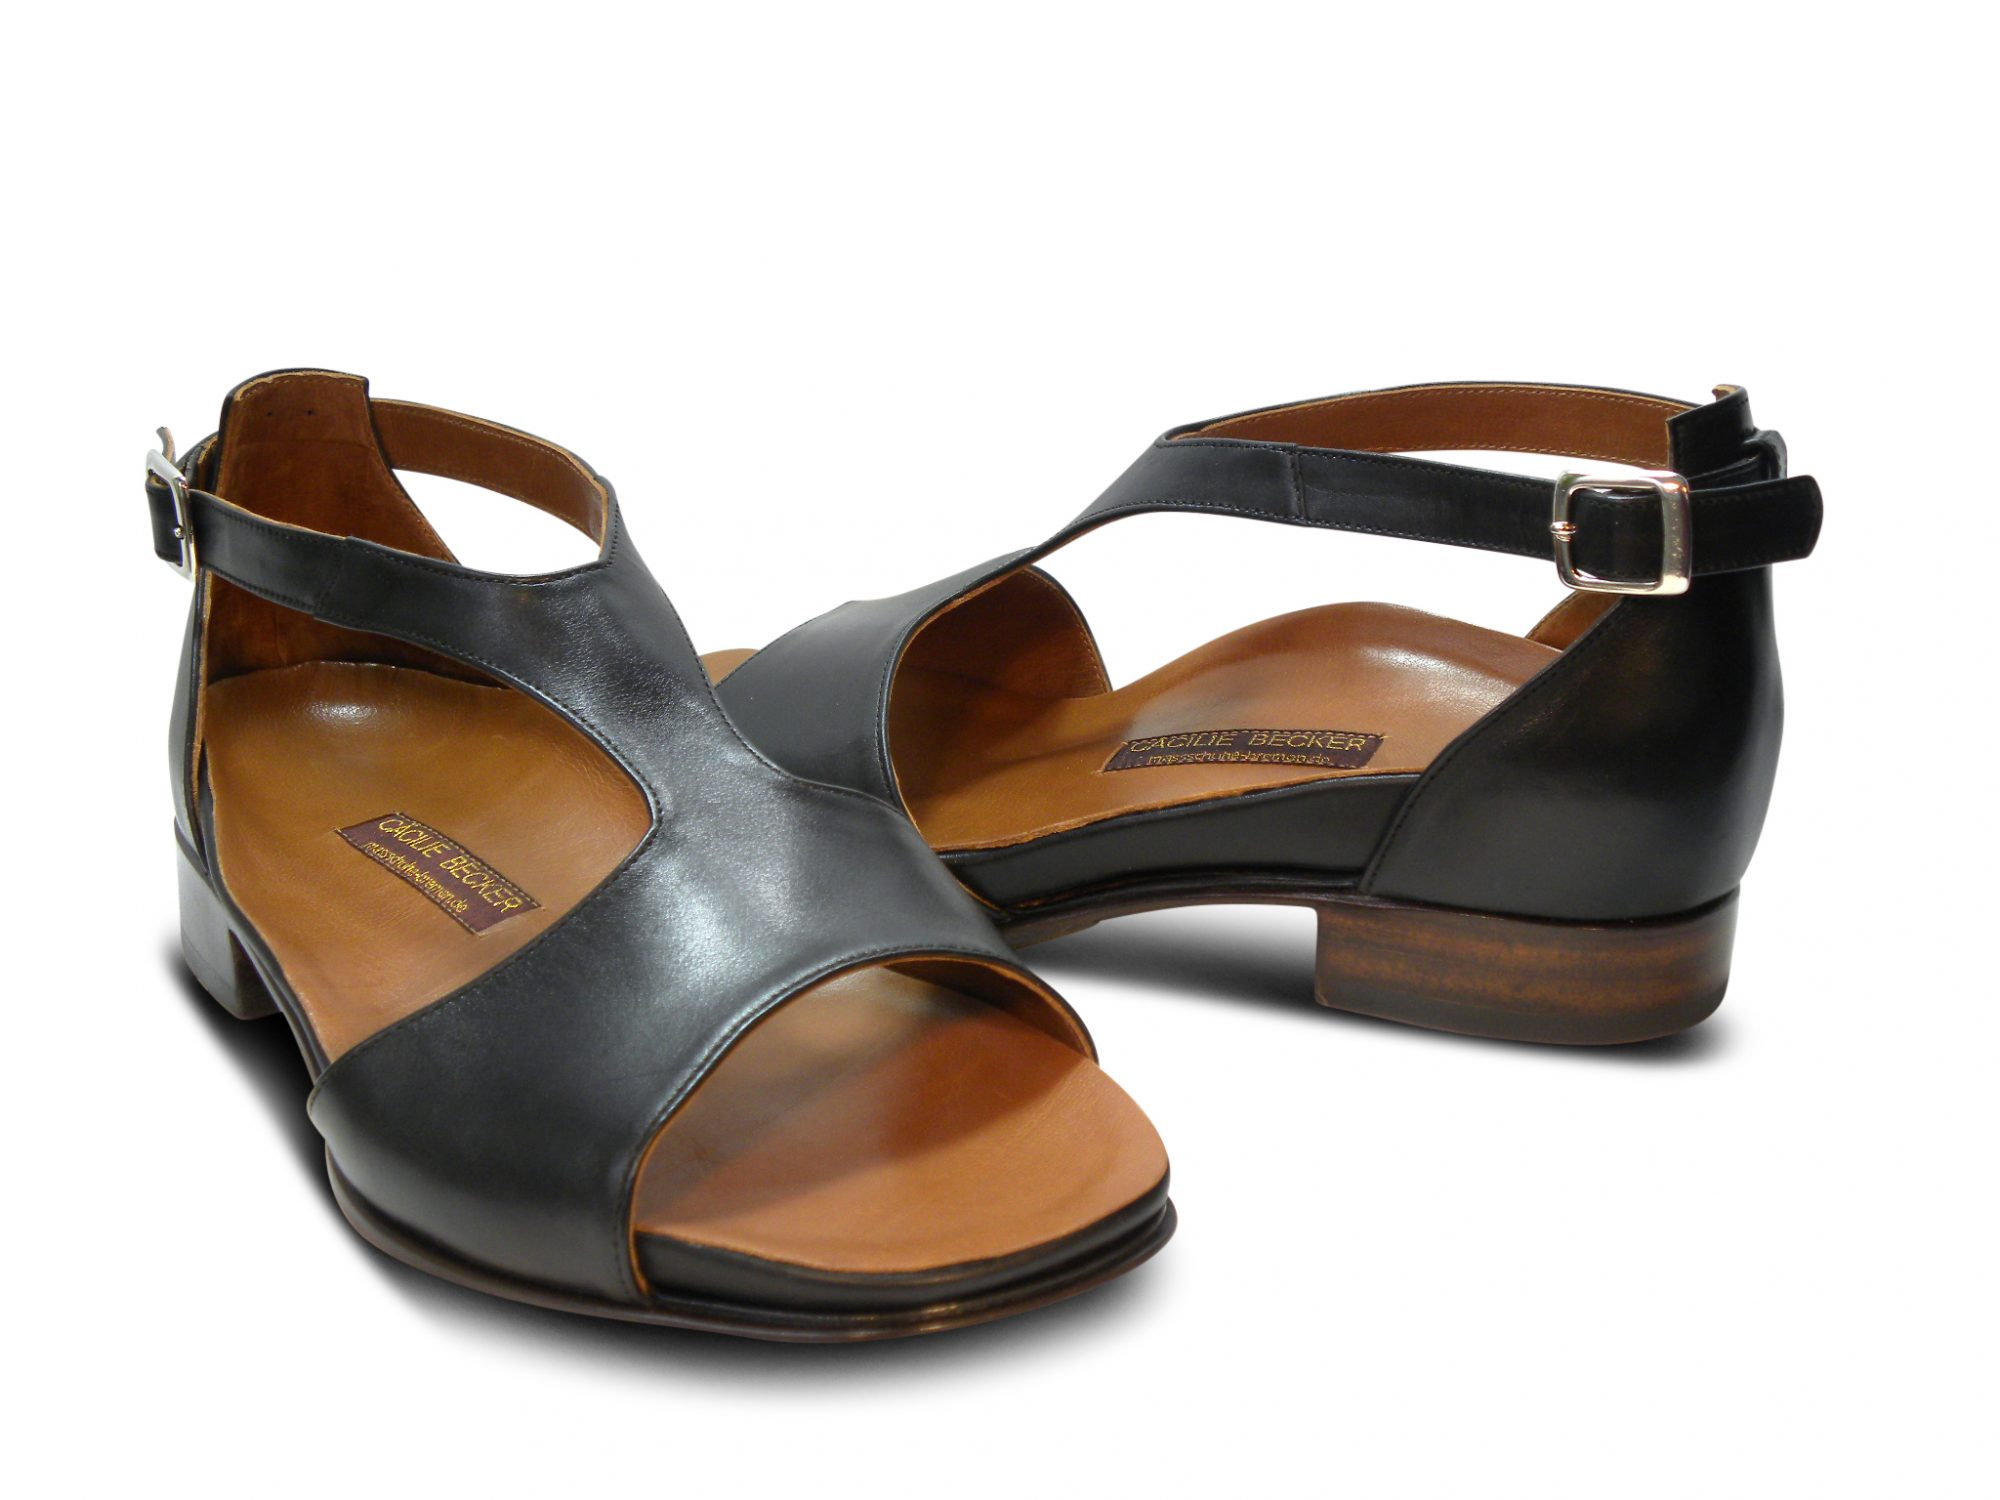 Sandalen mit Fußbett, Kalbsleder